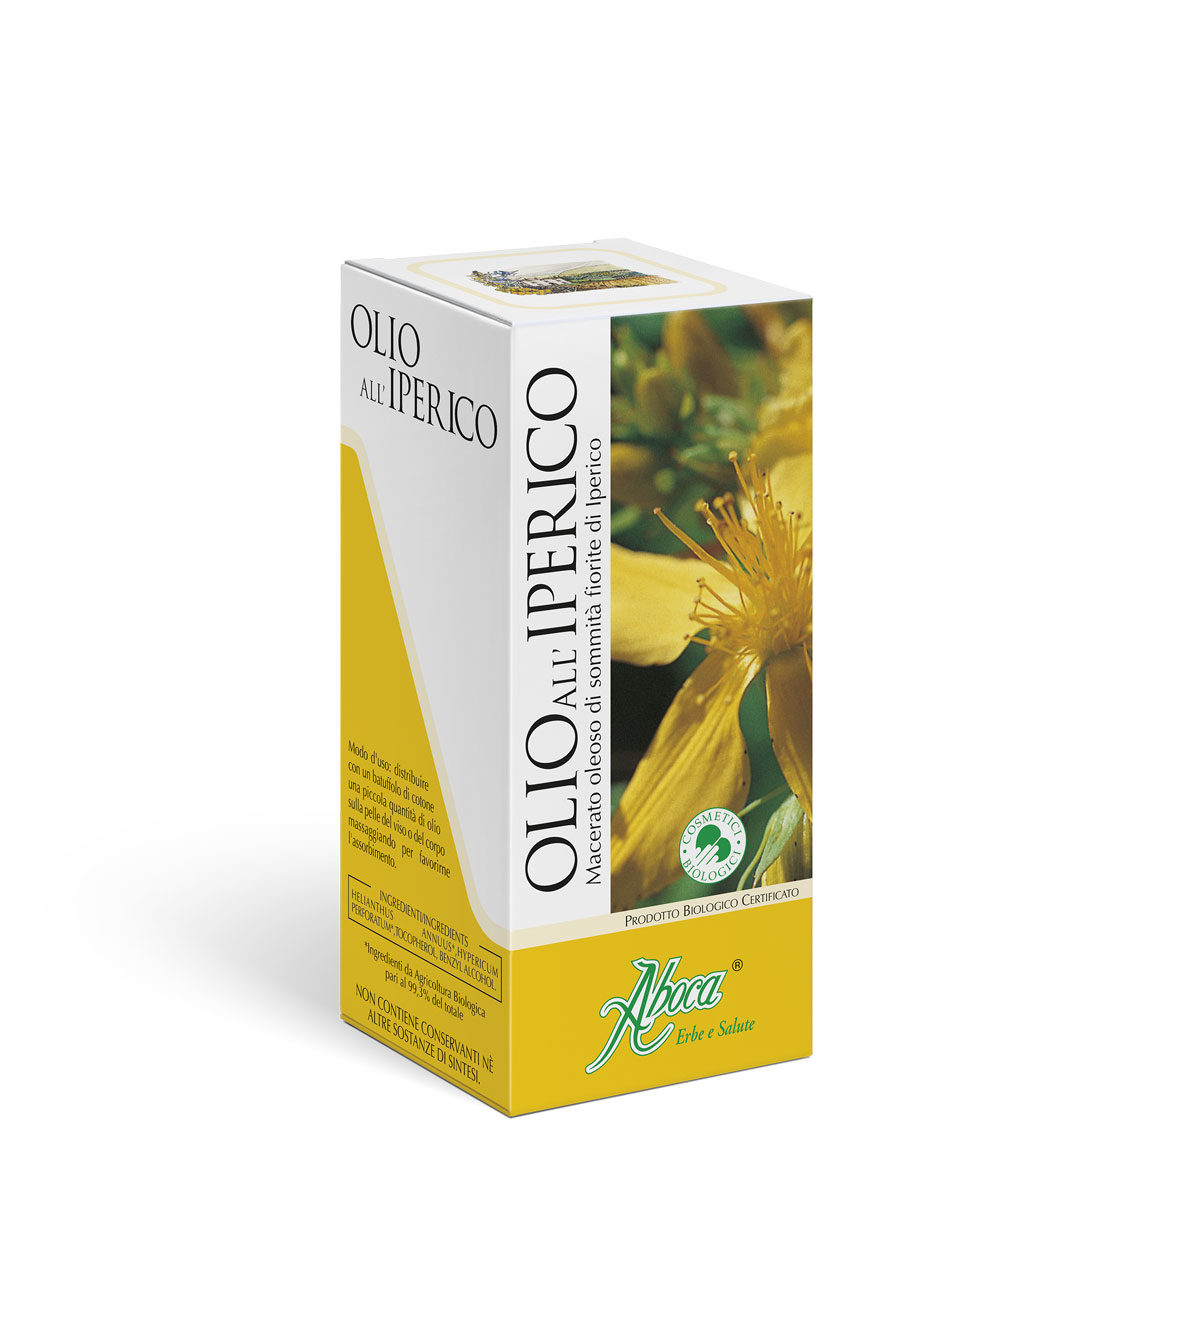 Image of Aboca Olio All'Iperico Cosmetico Biologico 100ml 904058435